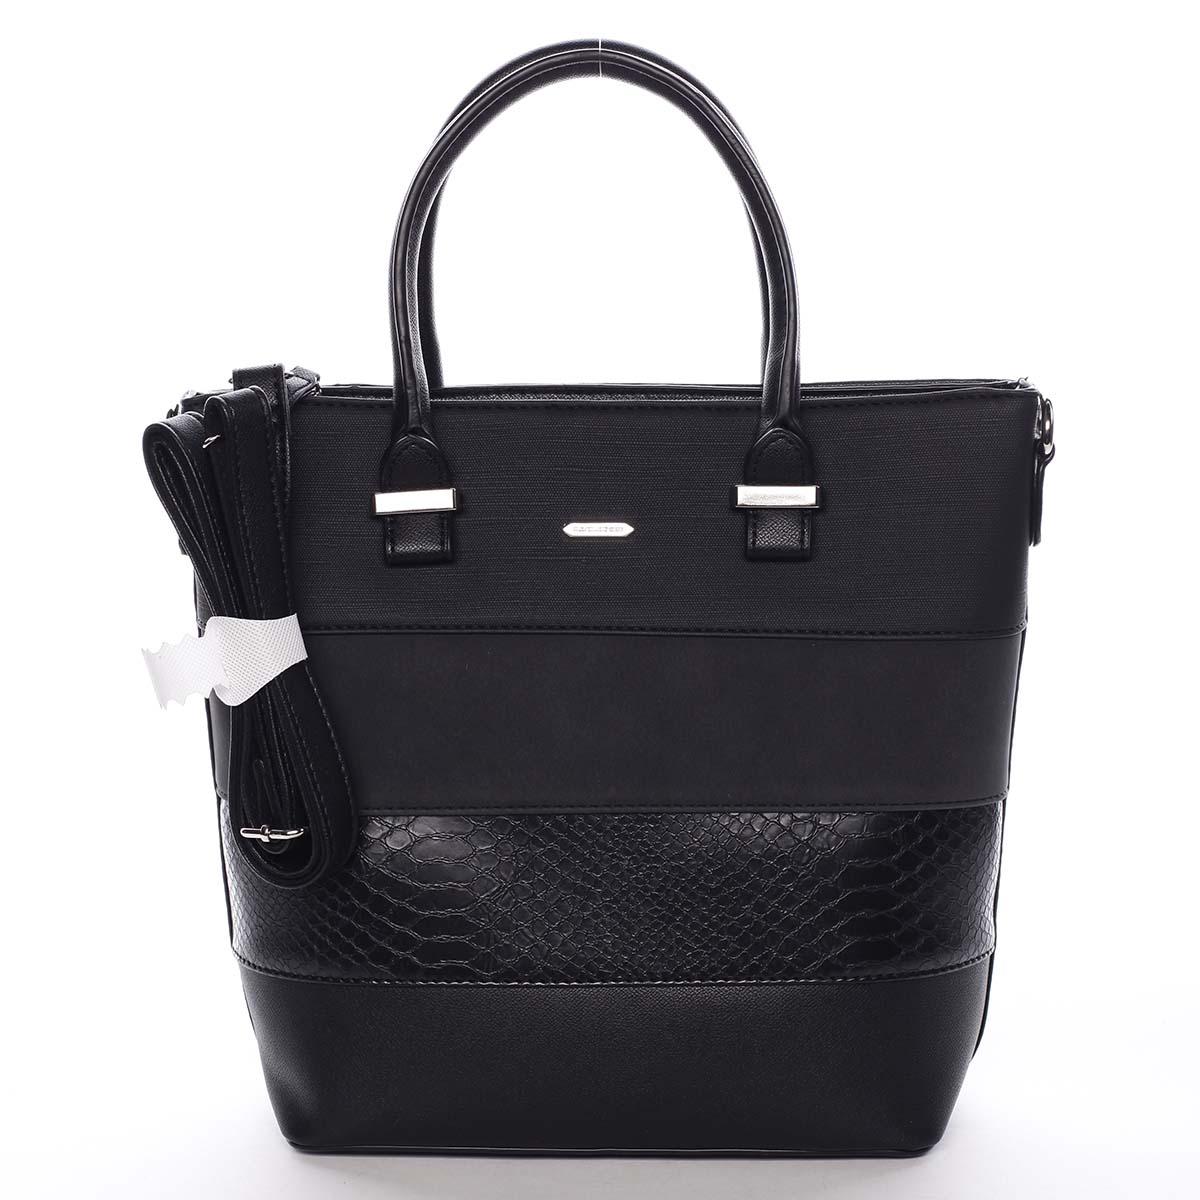 Dámská kabelka černá - David Jones Geeta